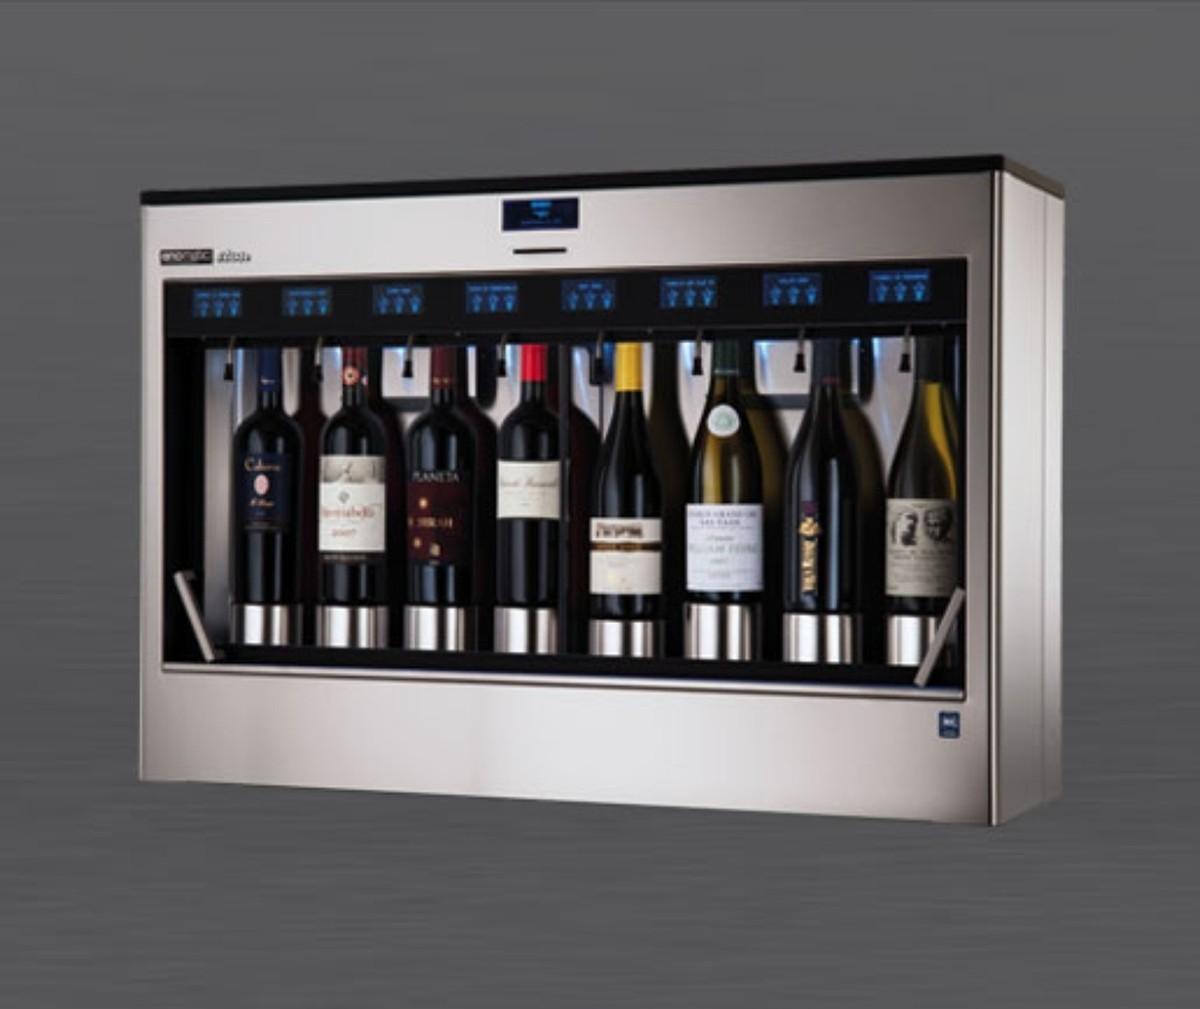 Exhibition Display Equipment : Secondhand exhibition and display equipment